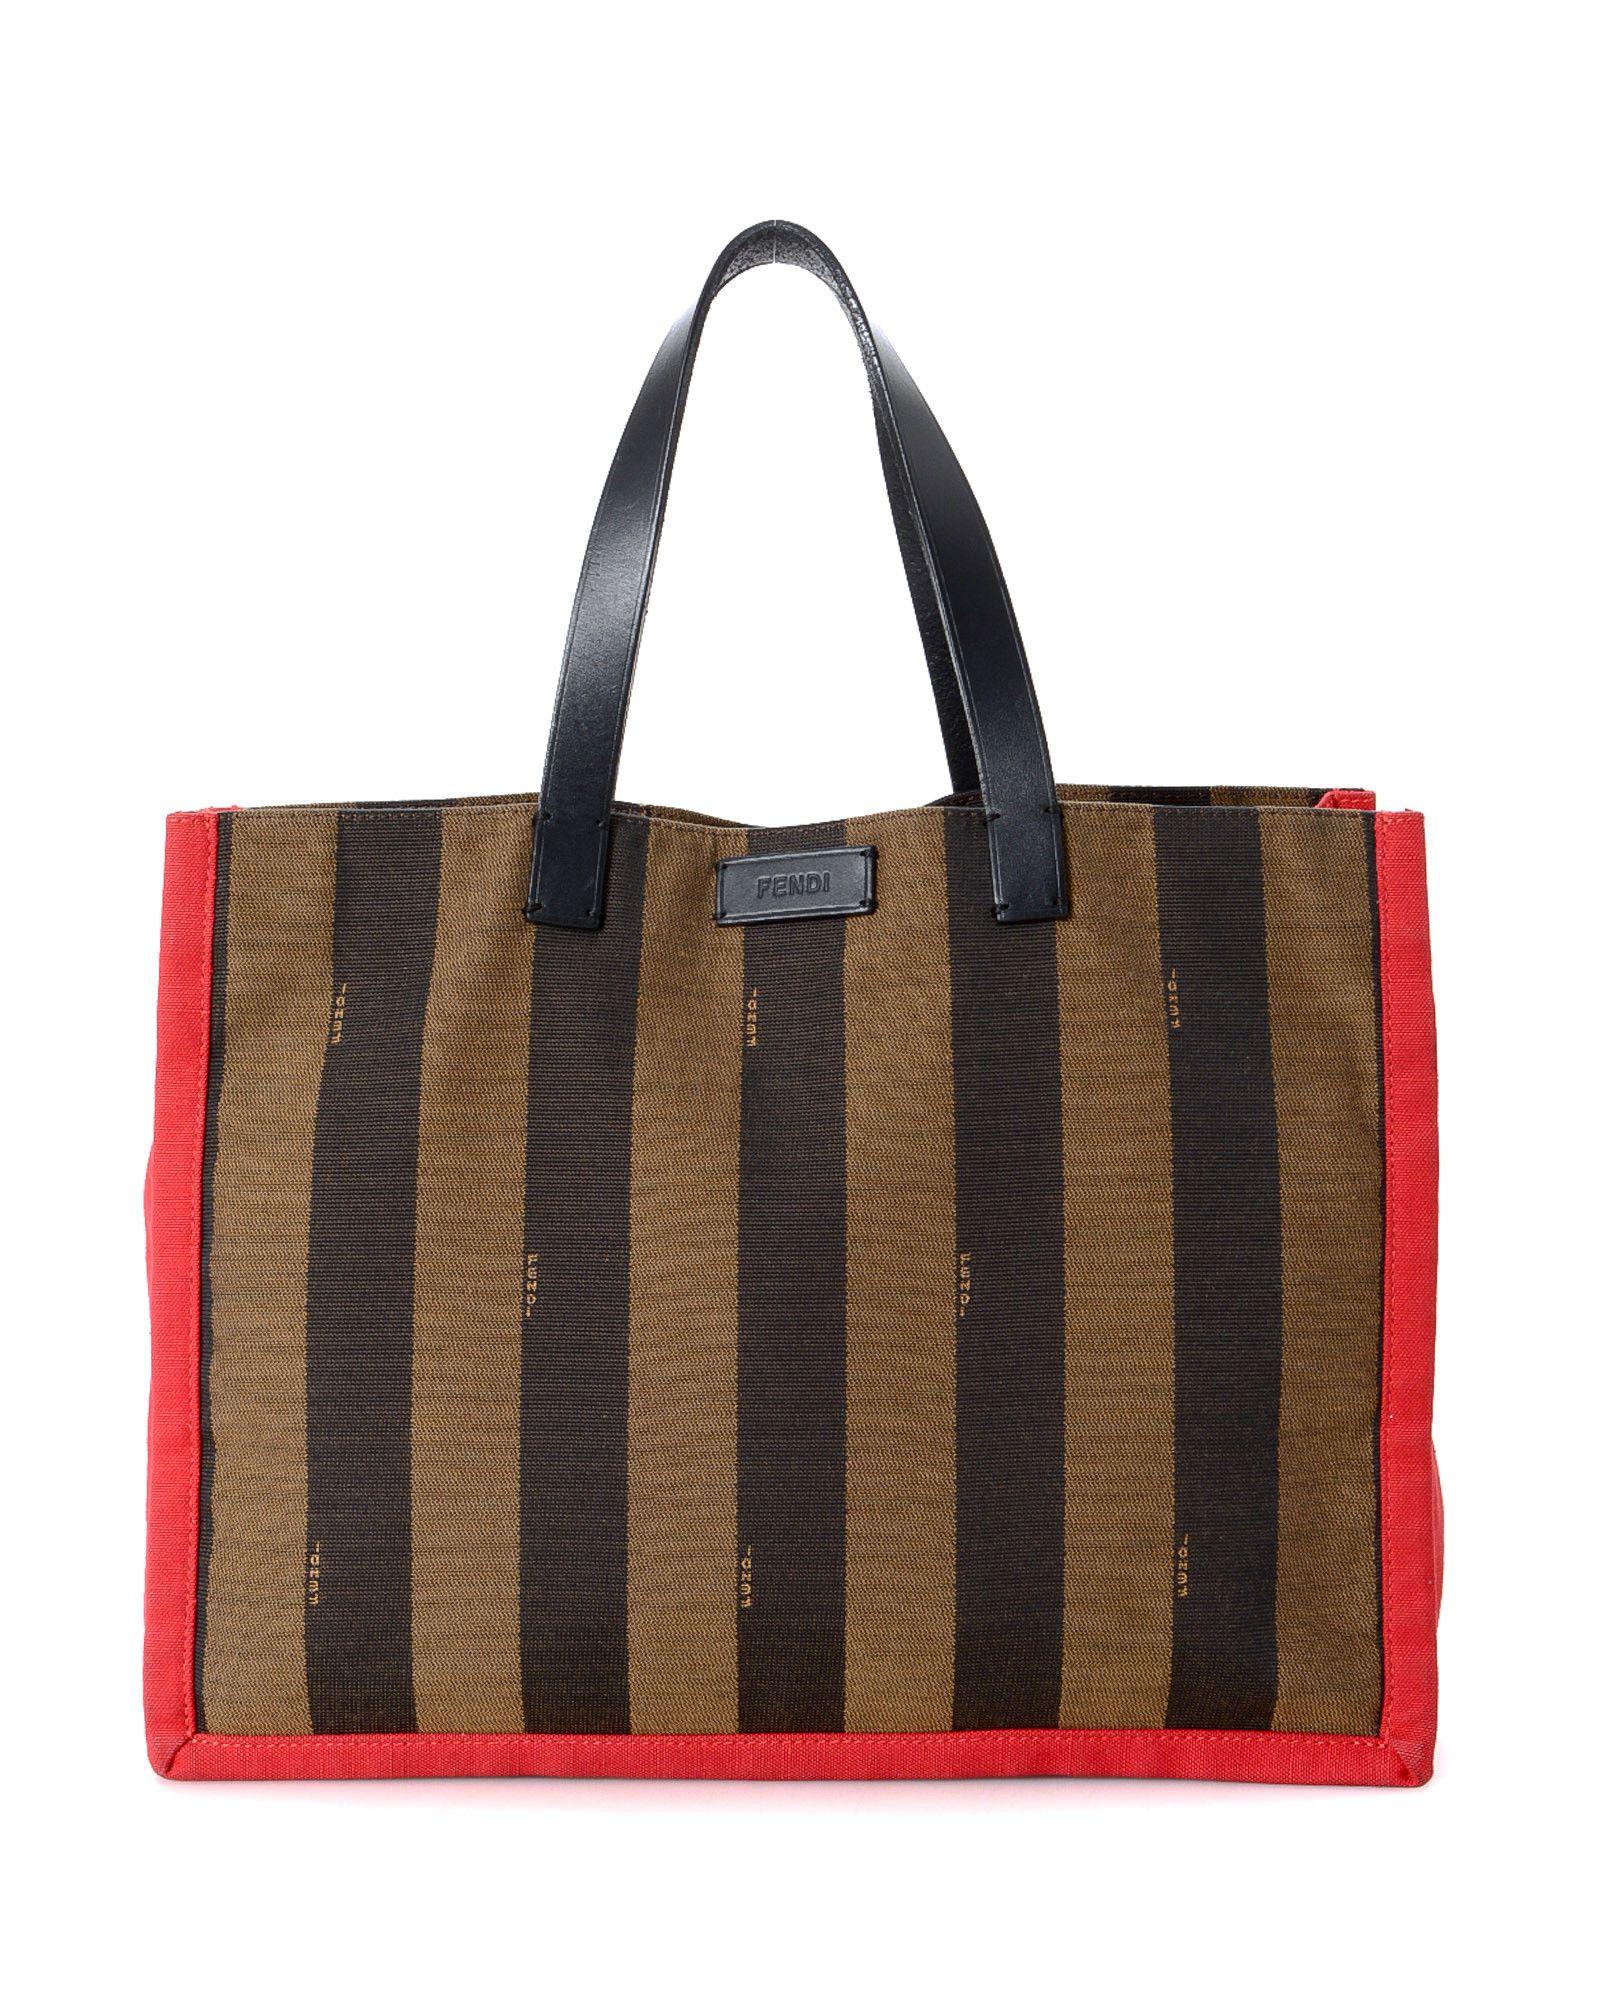 65b2d4b3ede8b4 Fendi Pequin Tote Bag - Vintage | *Century 21 Stores* | Tote Bag ...